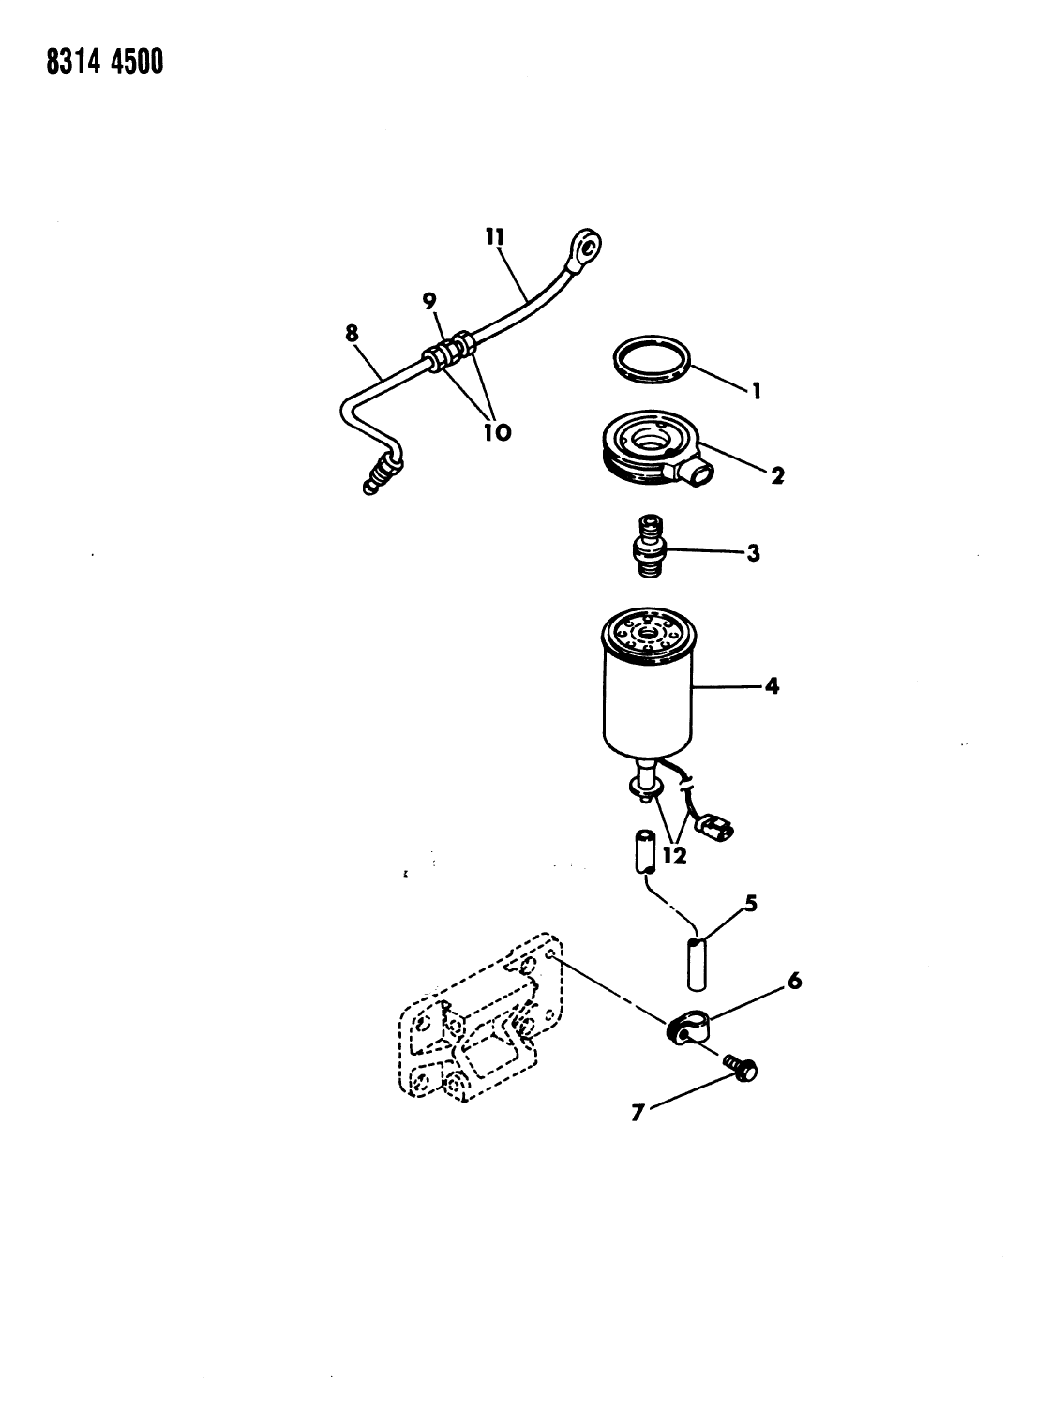 1989 Dodge Ramcharger Fuel Filter - Thumbnail 2